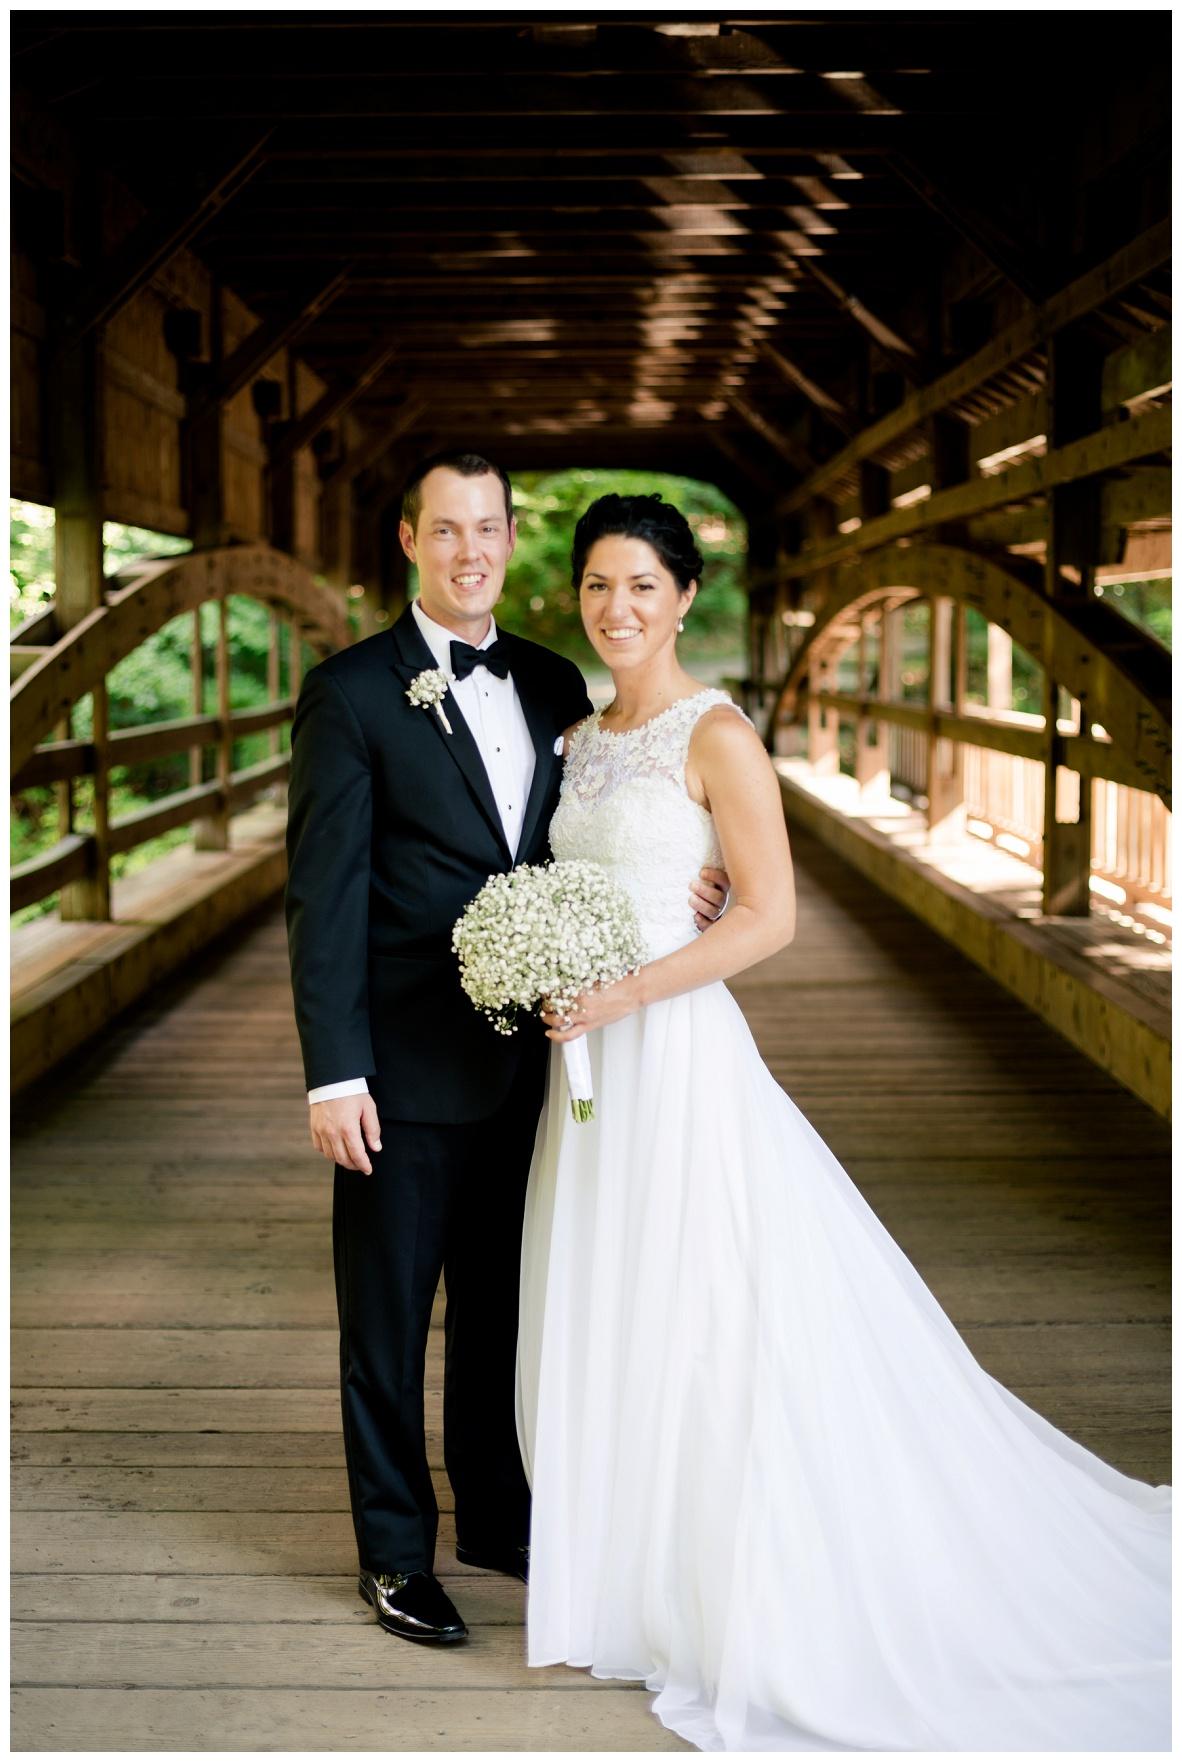 The Wedding of Danielle and Matt_0051.jpg